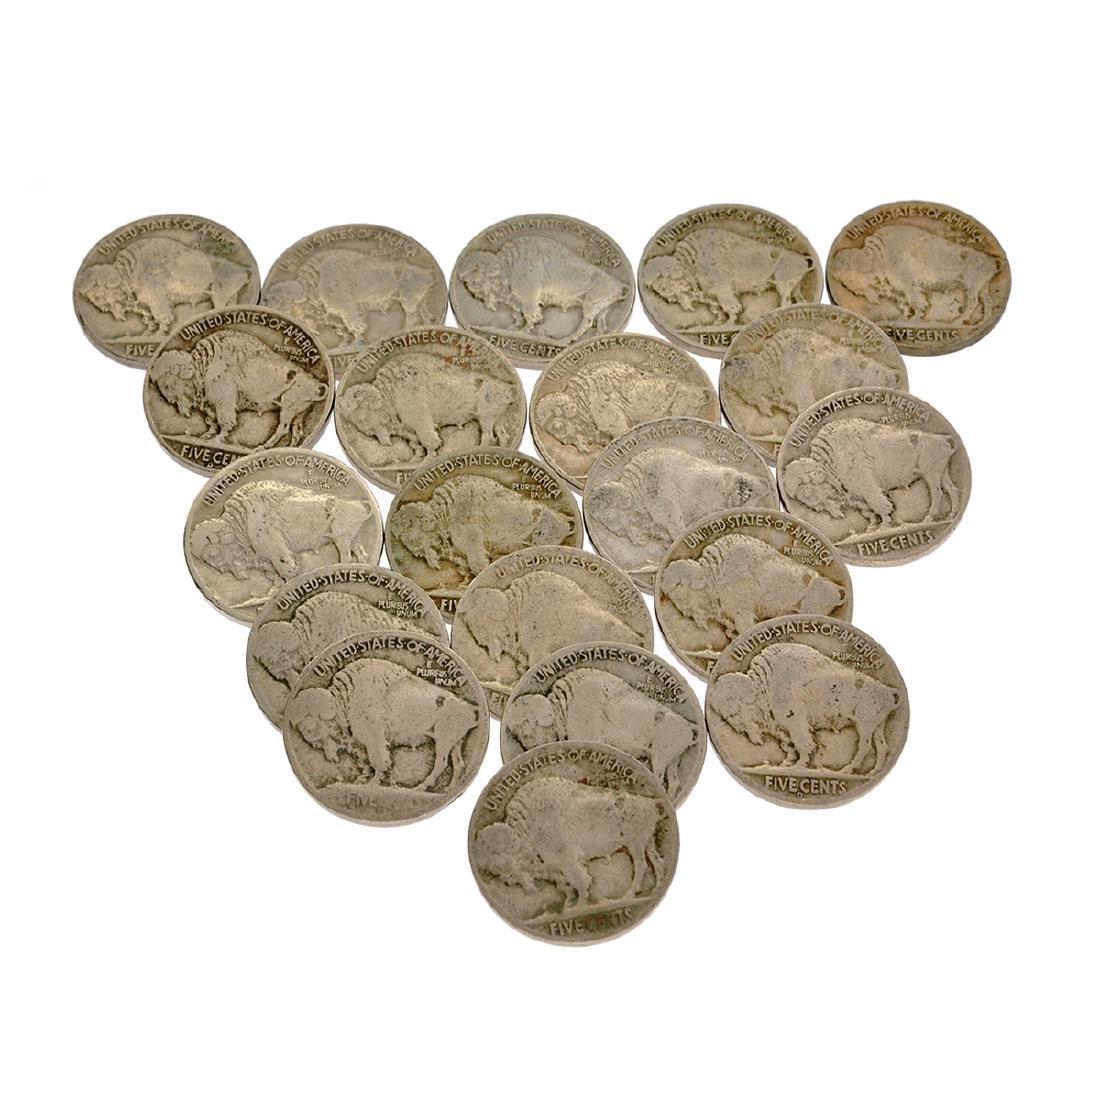 20 Misc. Buffalo Nickel Coins - 2